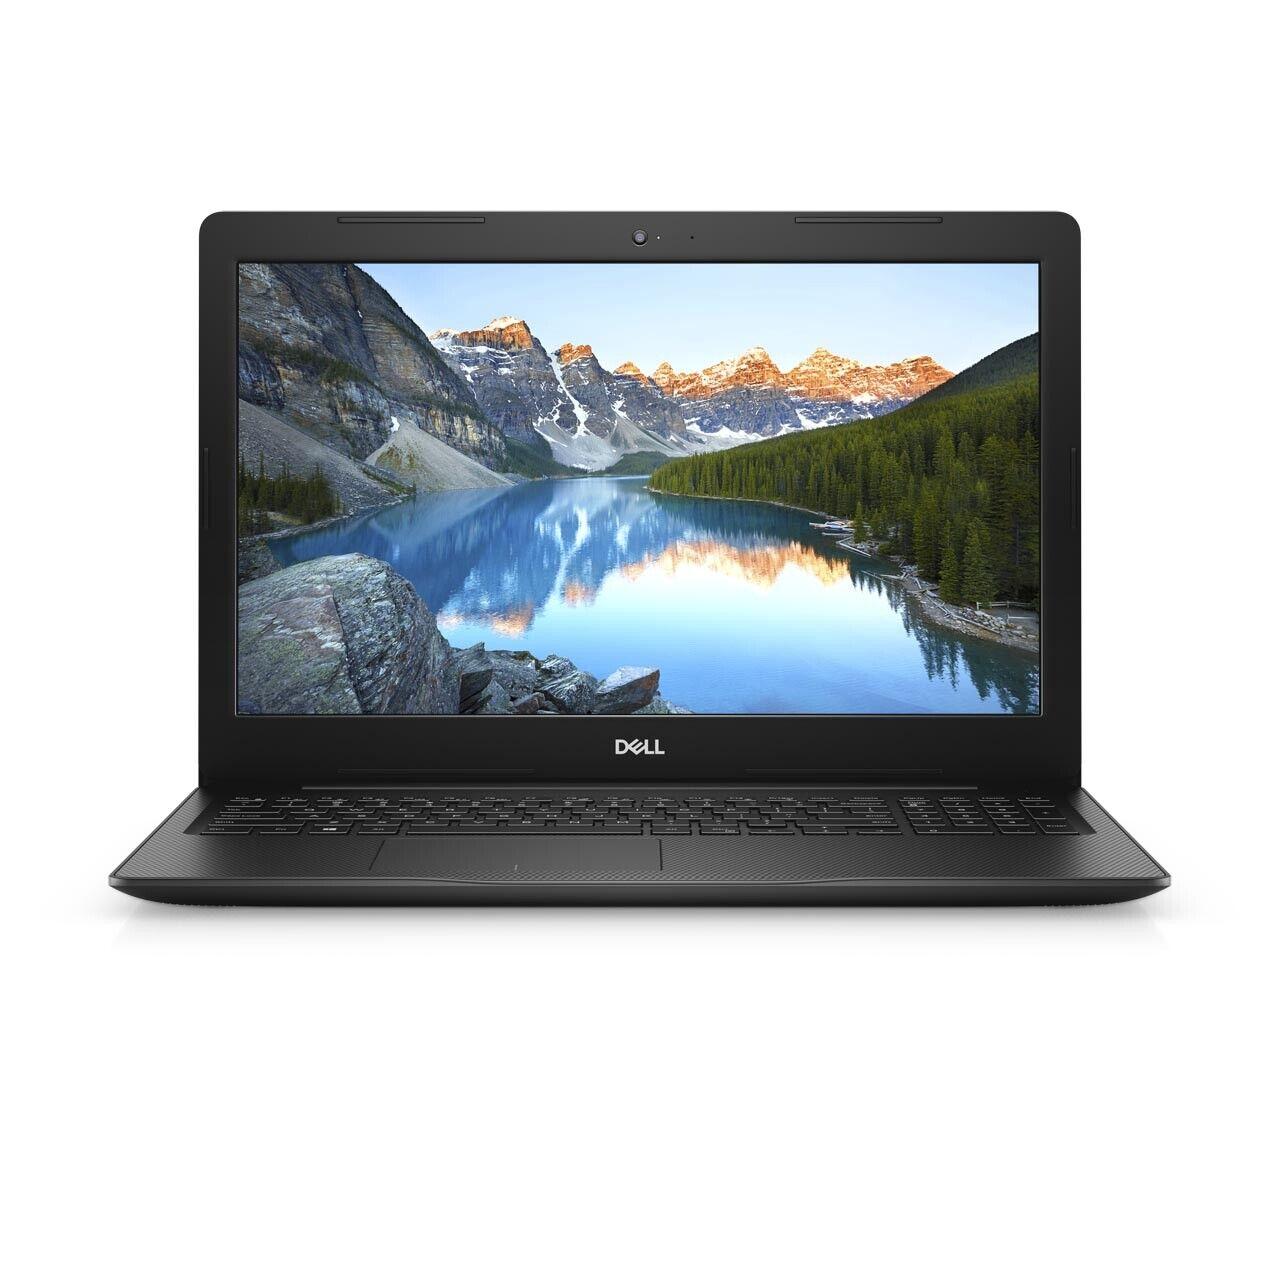 "Dell Inspiron 15 3593 Laptop 15.6"" FHD Touch Intel i7-1065G7 1TB HDD 12GB RAM"